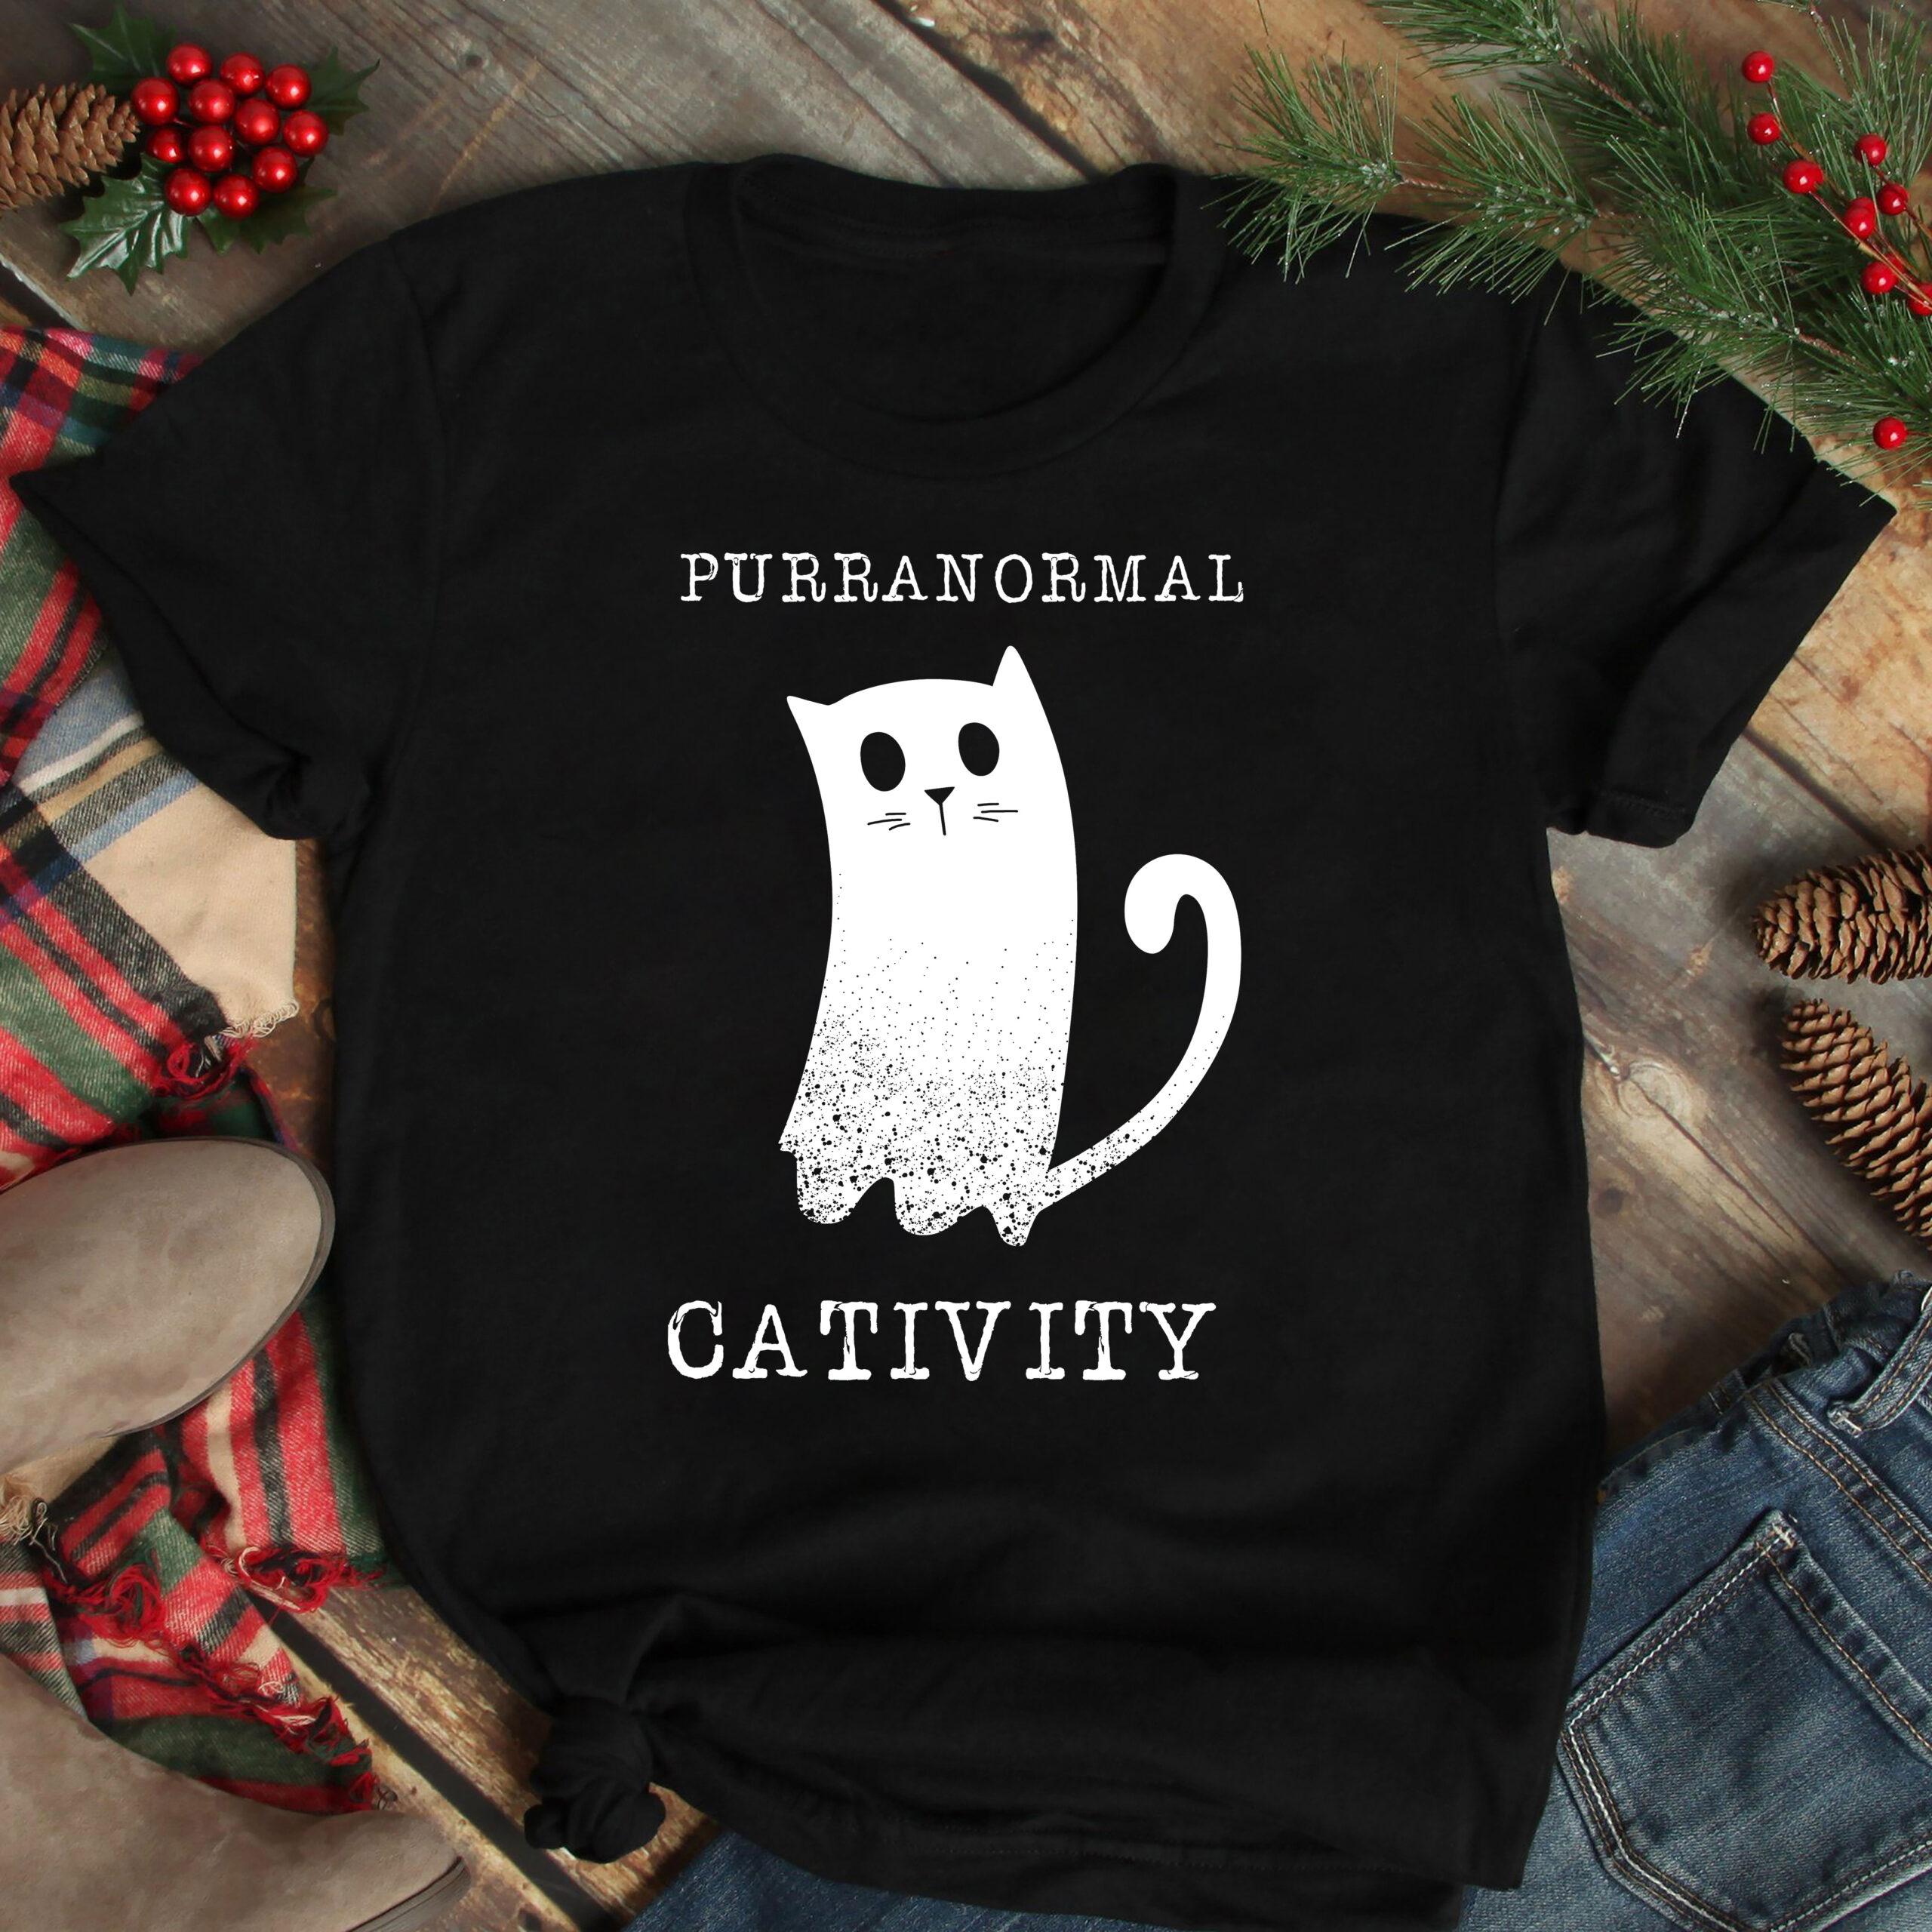 Purranormal Cativity Shirt Cat HalloweenPurranormal Cativity Shirt Cat Halloween